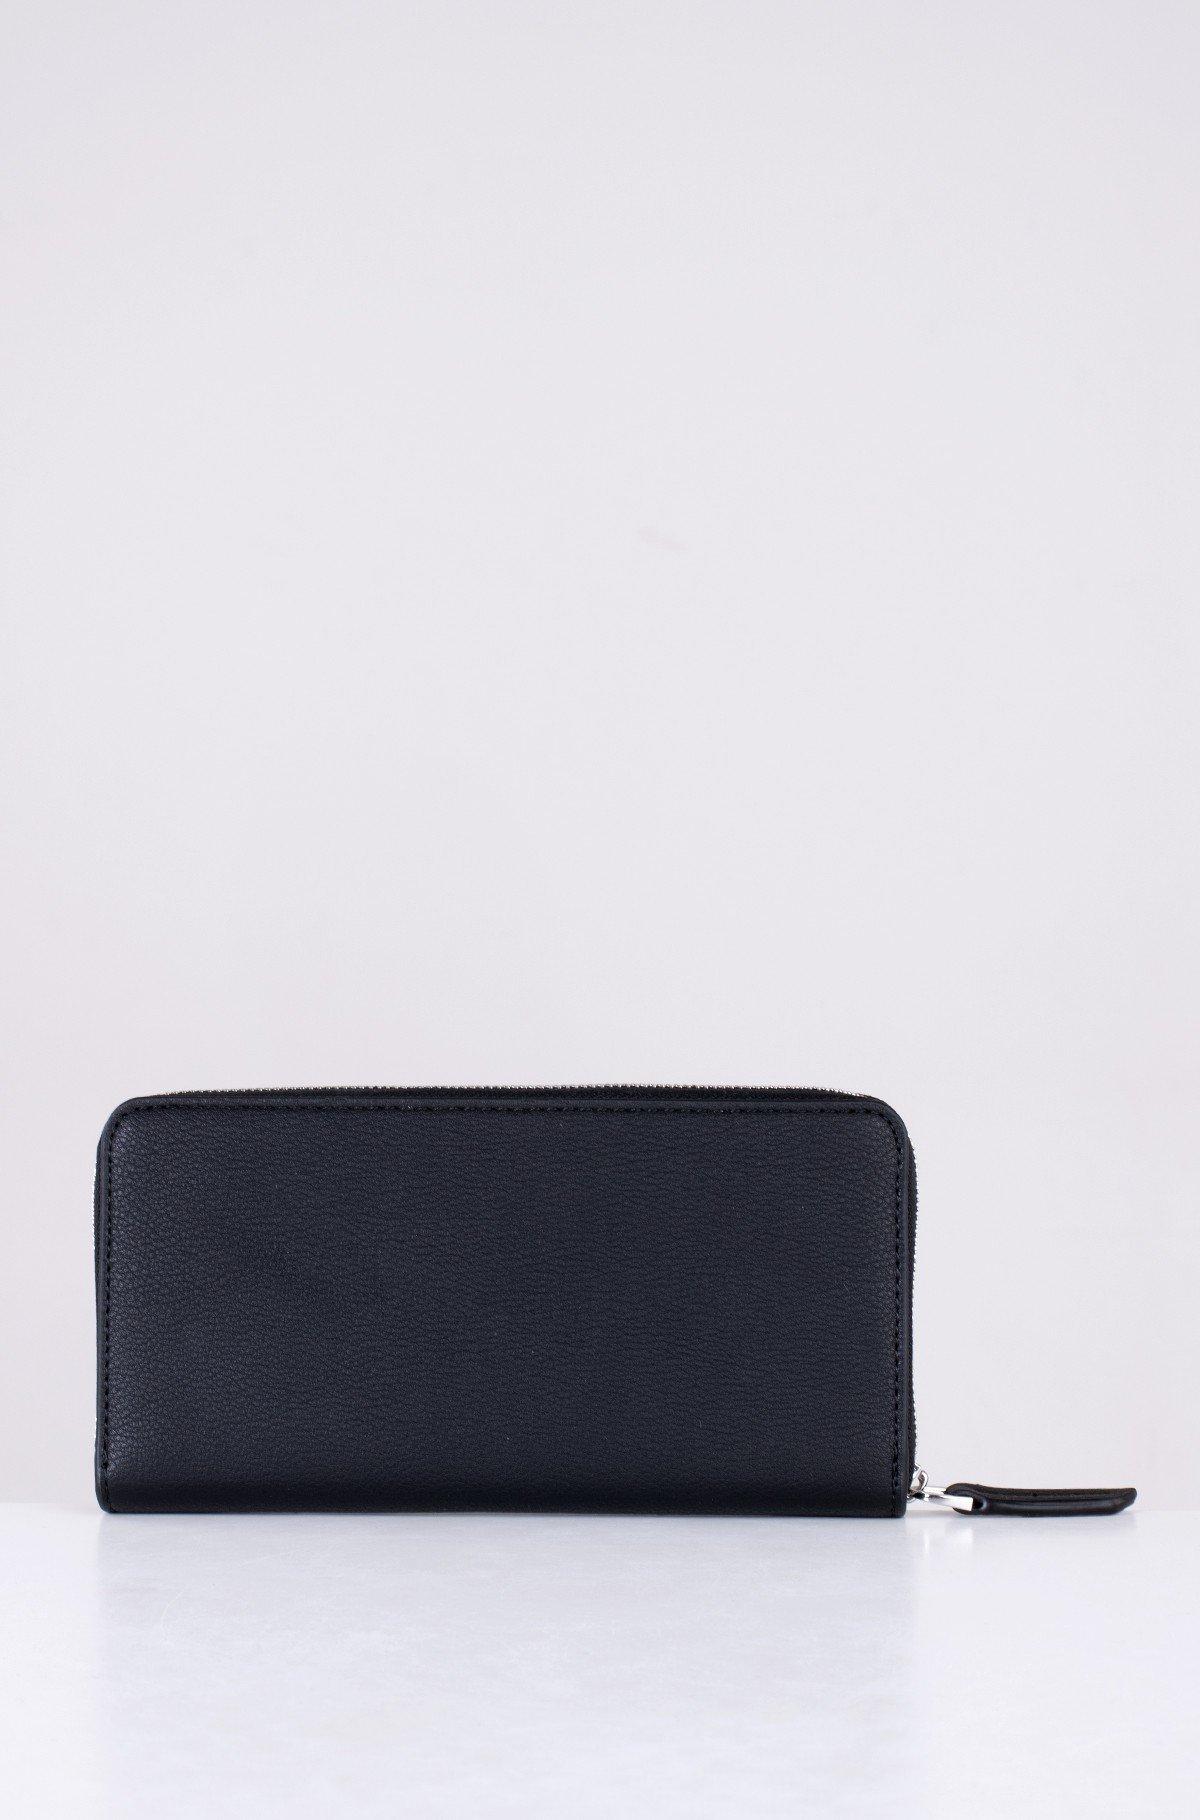 Rahakott Z/A WALLET LG K60K606698-full-2